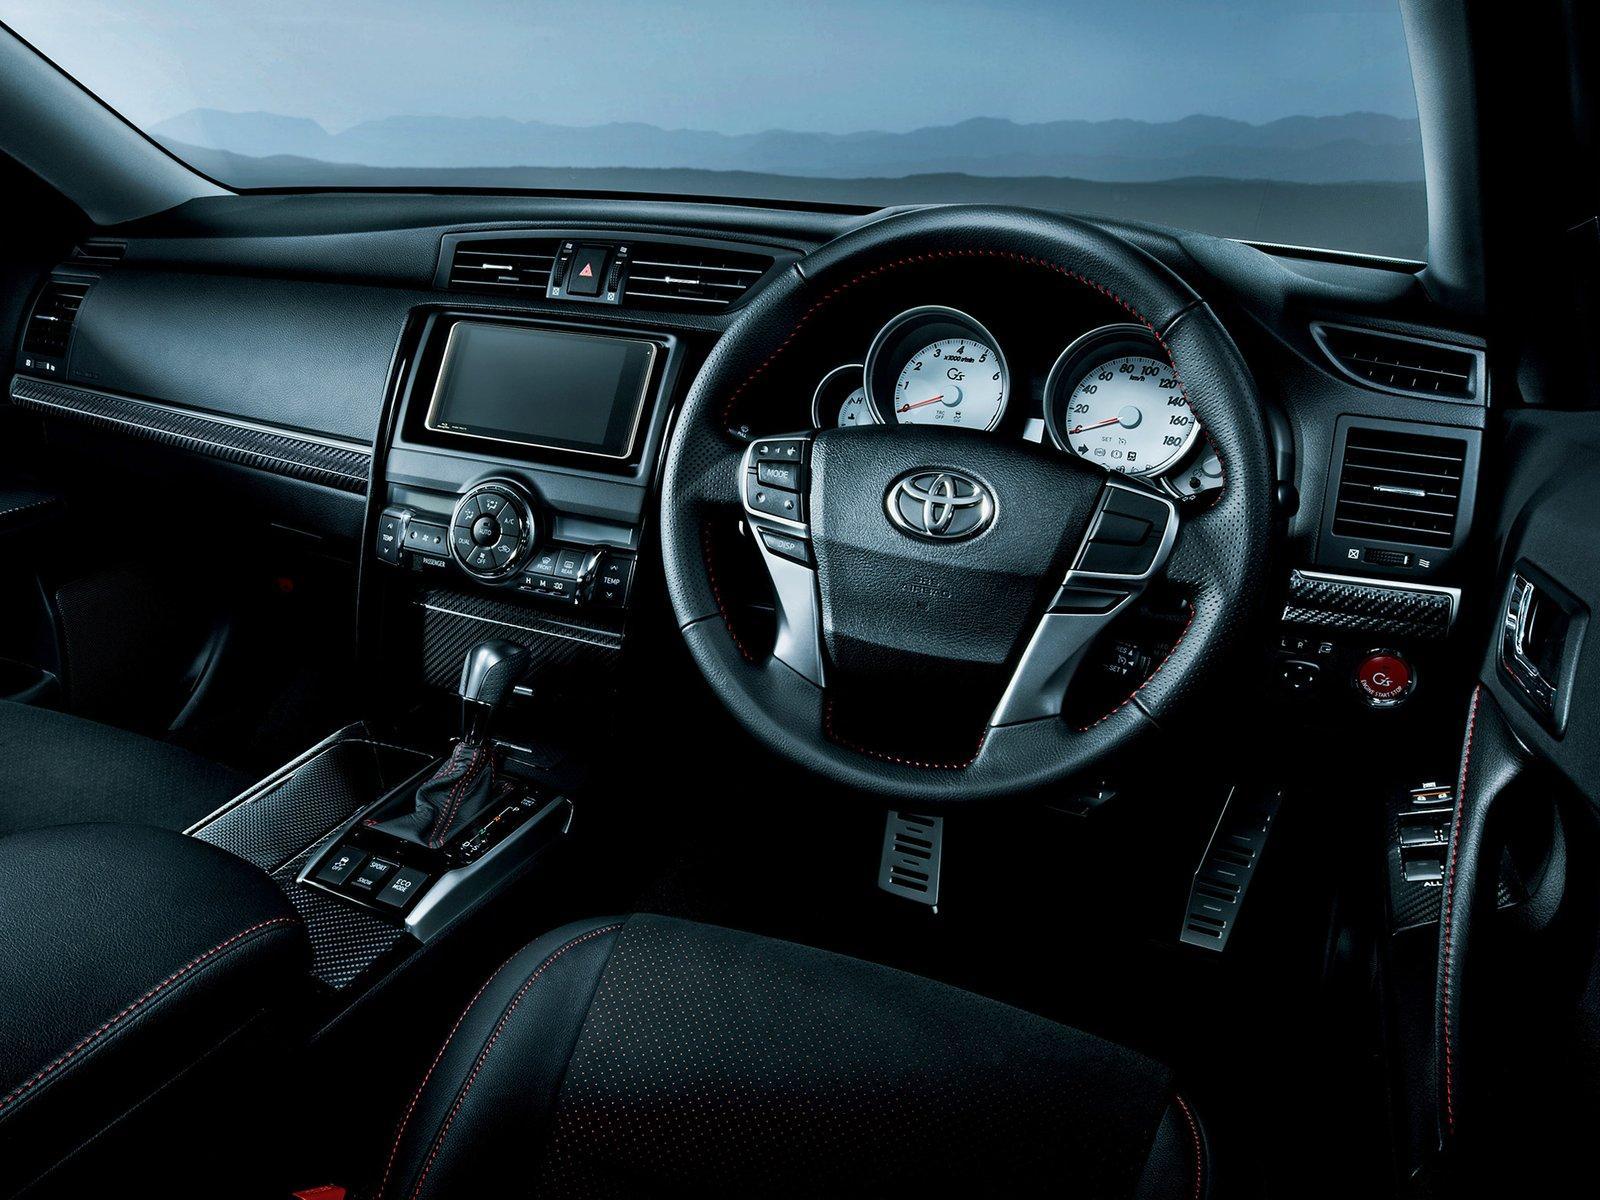 2013 Toyota Mark X Facelift - Japan-Only - autoevolution